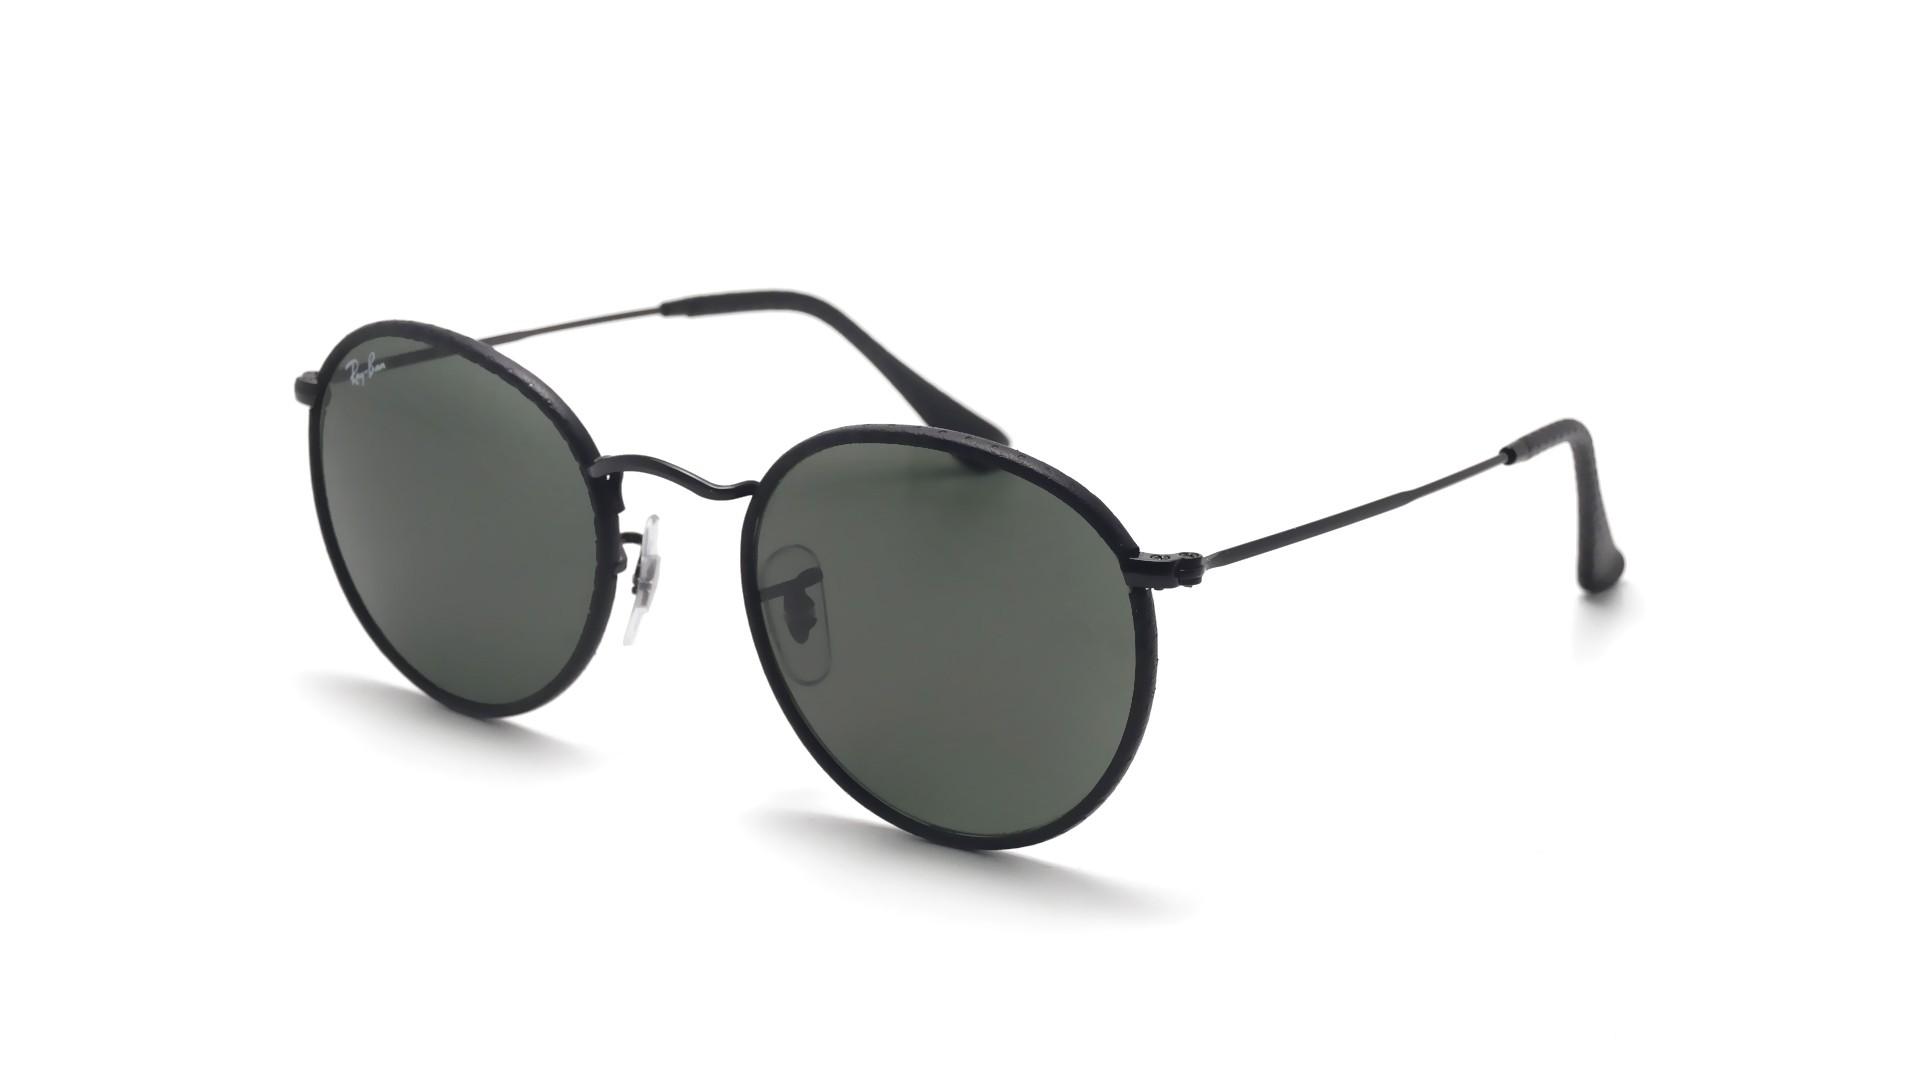 26d555fd386 Sunglasses Ray-Ban Round Craft Black RB3475Q 9040 50-21 Medium